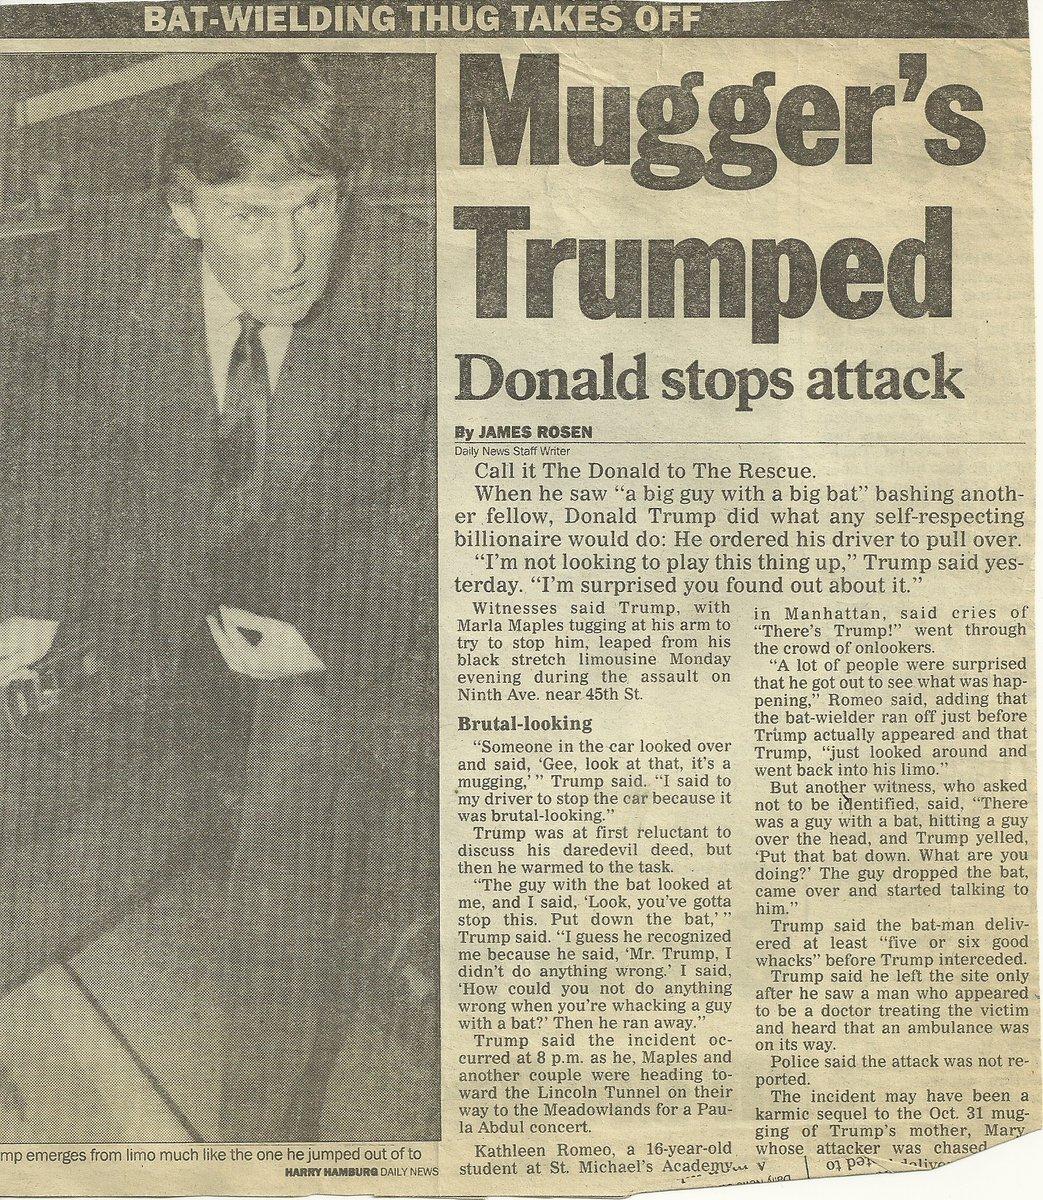 Mugger's Trumped : Donald Stops Attack